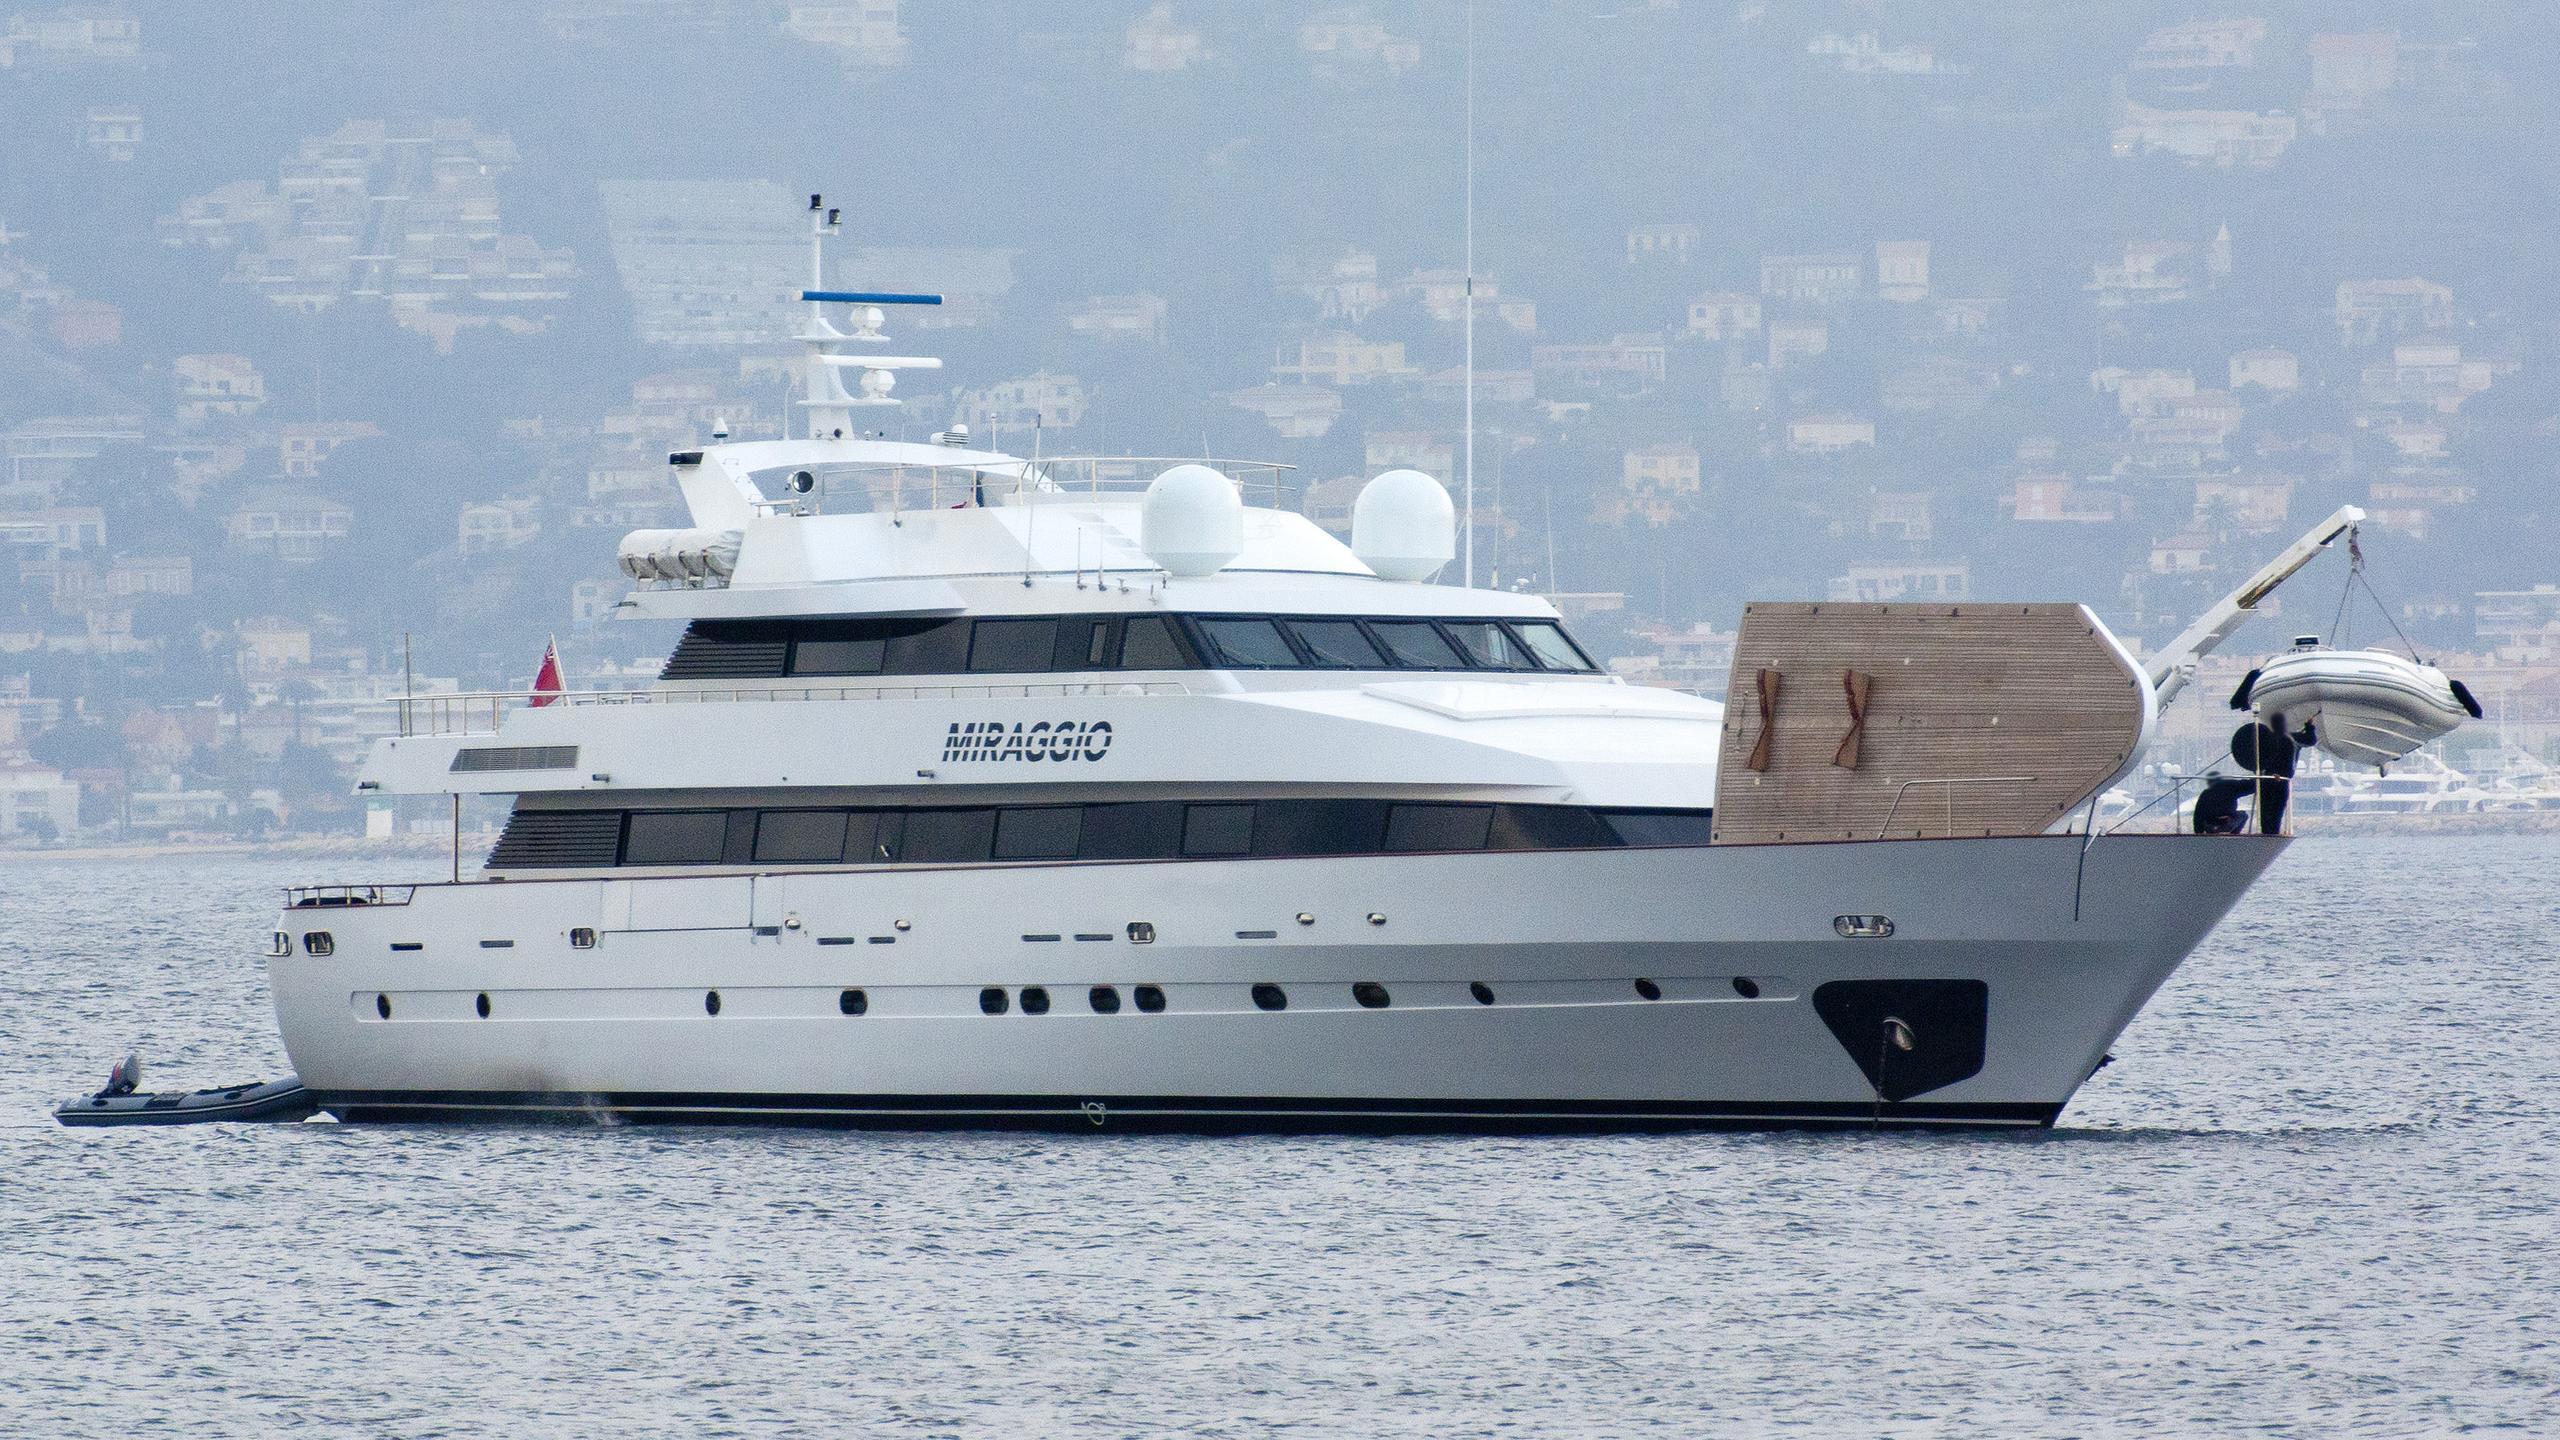 miraggio-motor-yacht-siar-moschini-1988-41m-half-profile